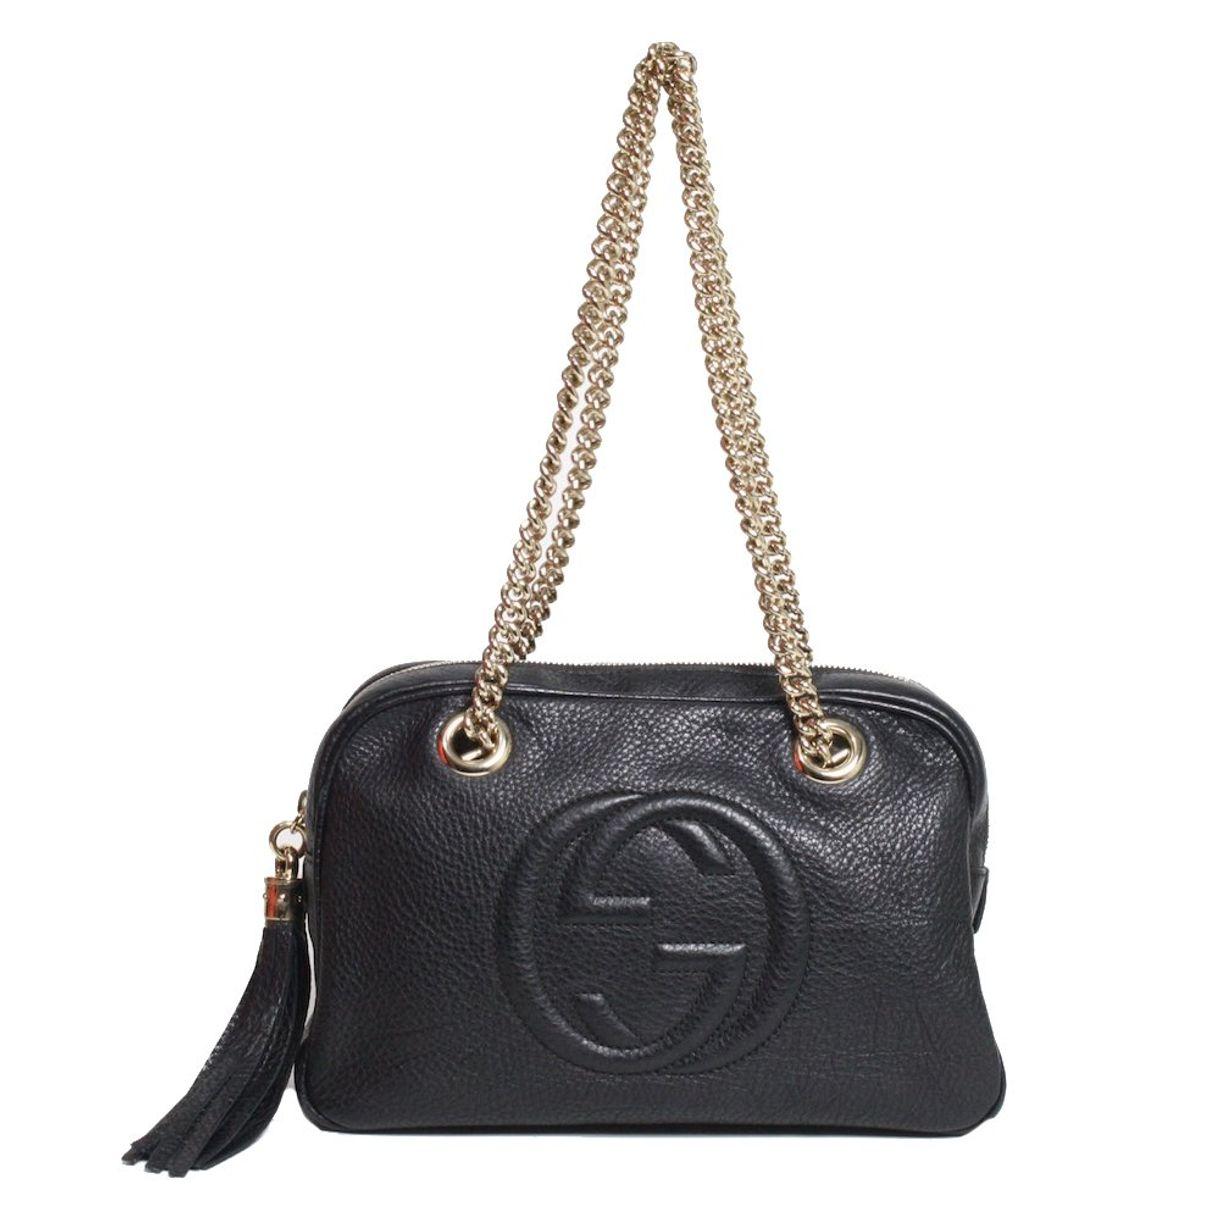 Bolsa-Gucci-Soho-Shoulder-Chain